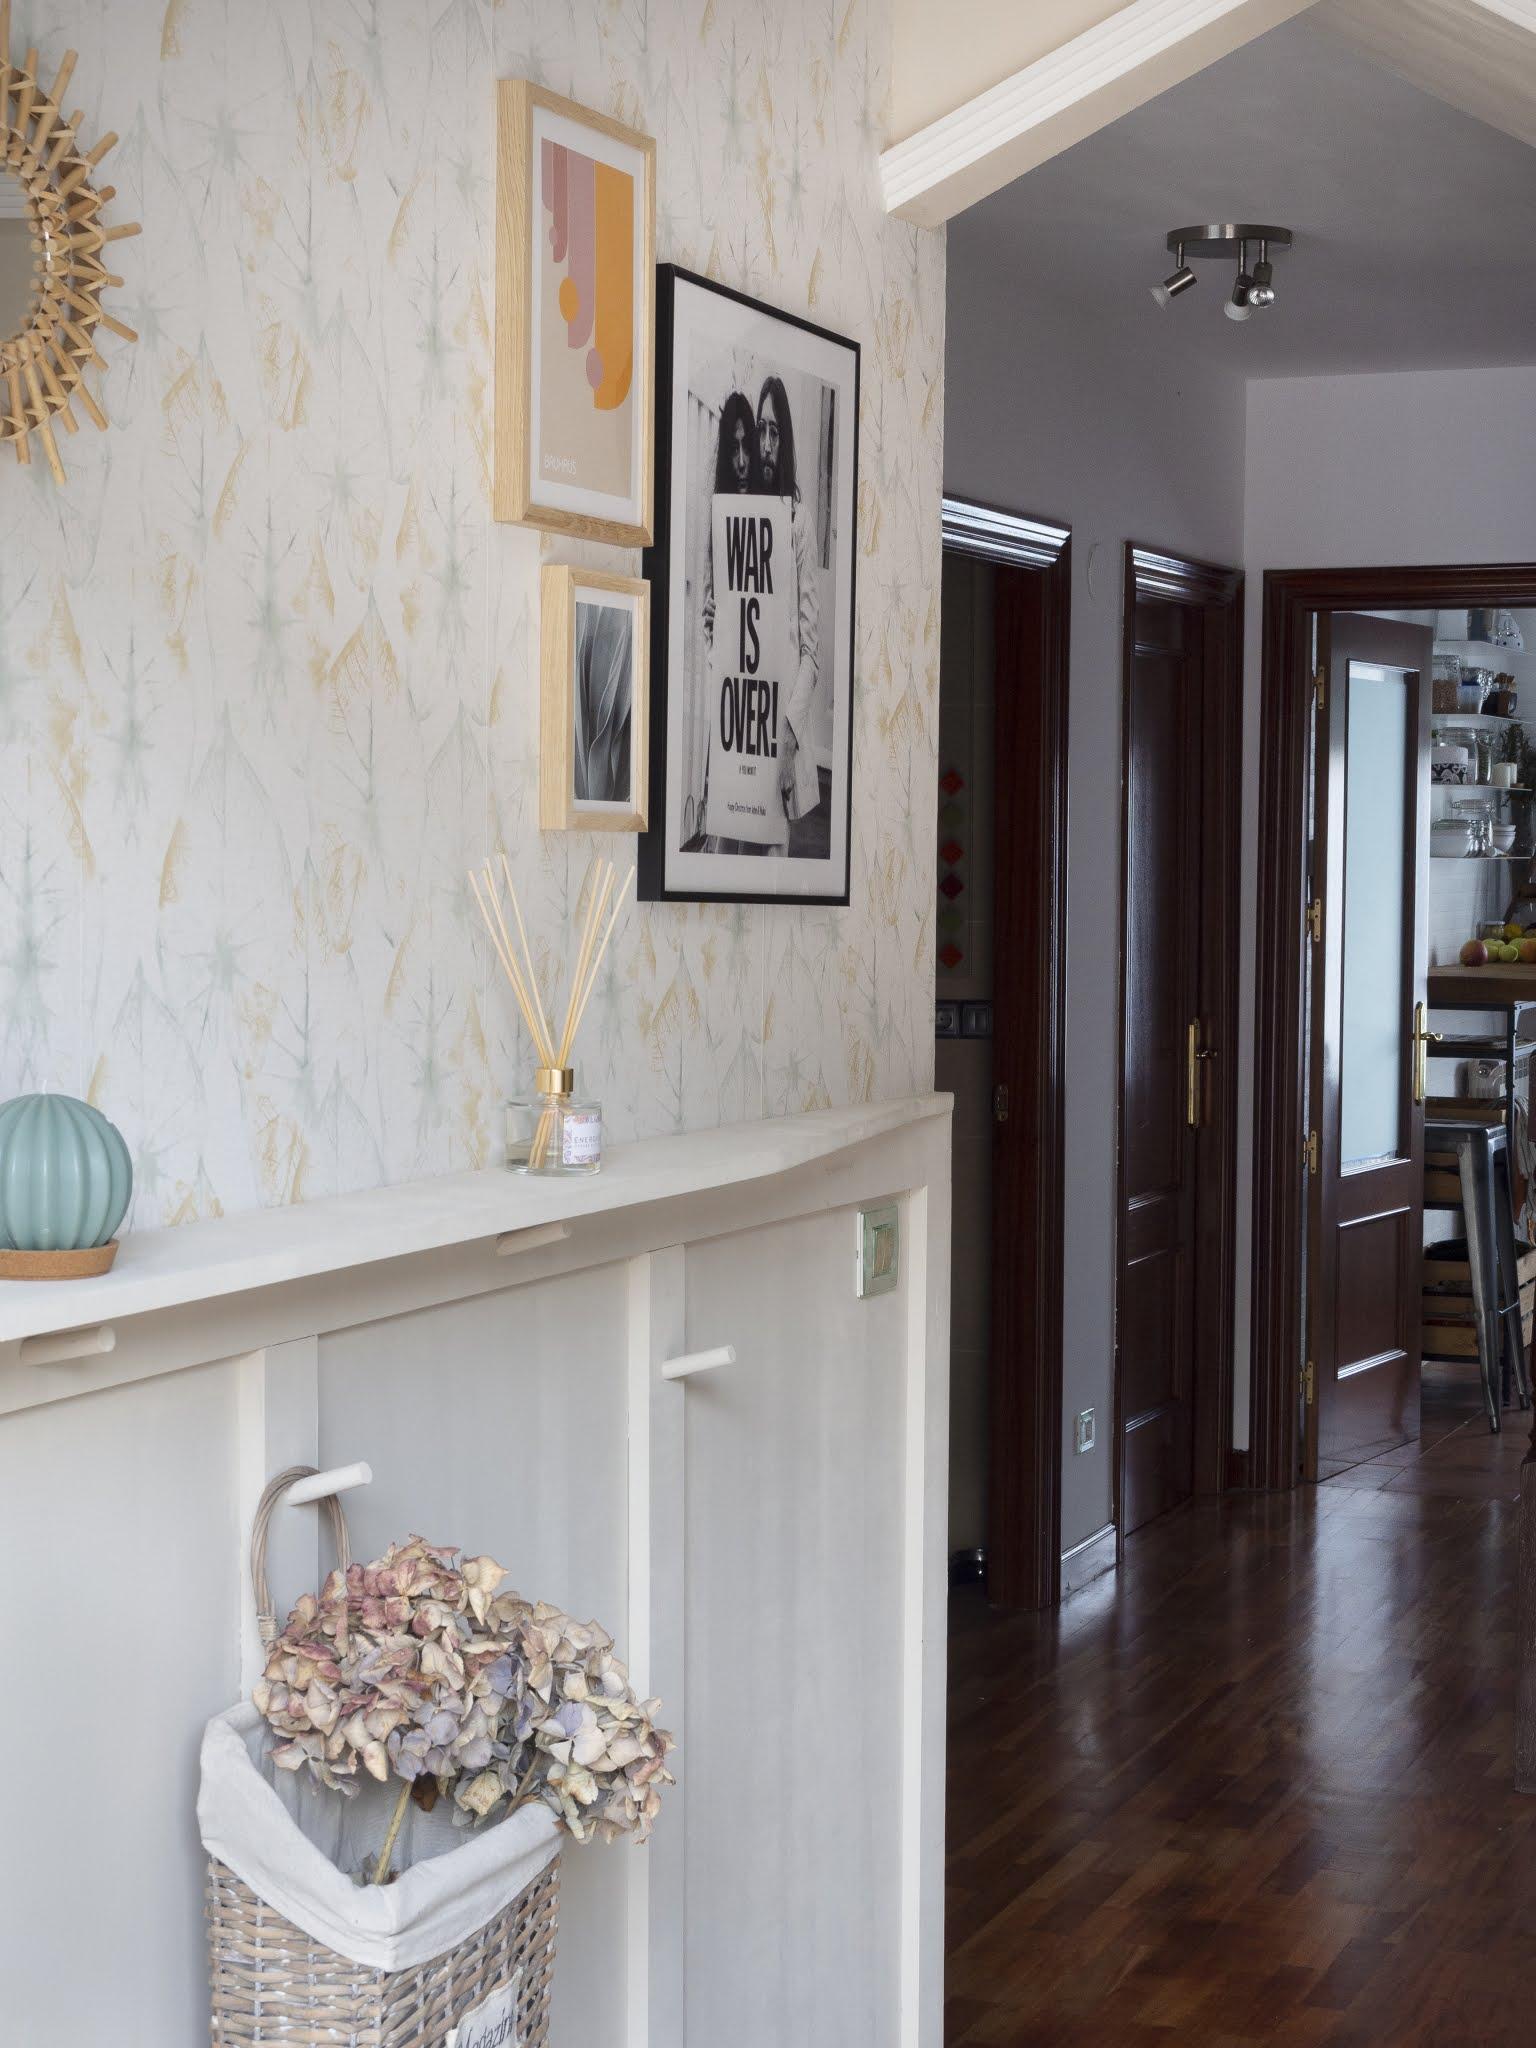 4 trucos para decorar de forma coherente vuestro hogar_5